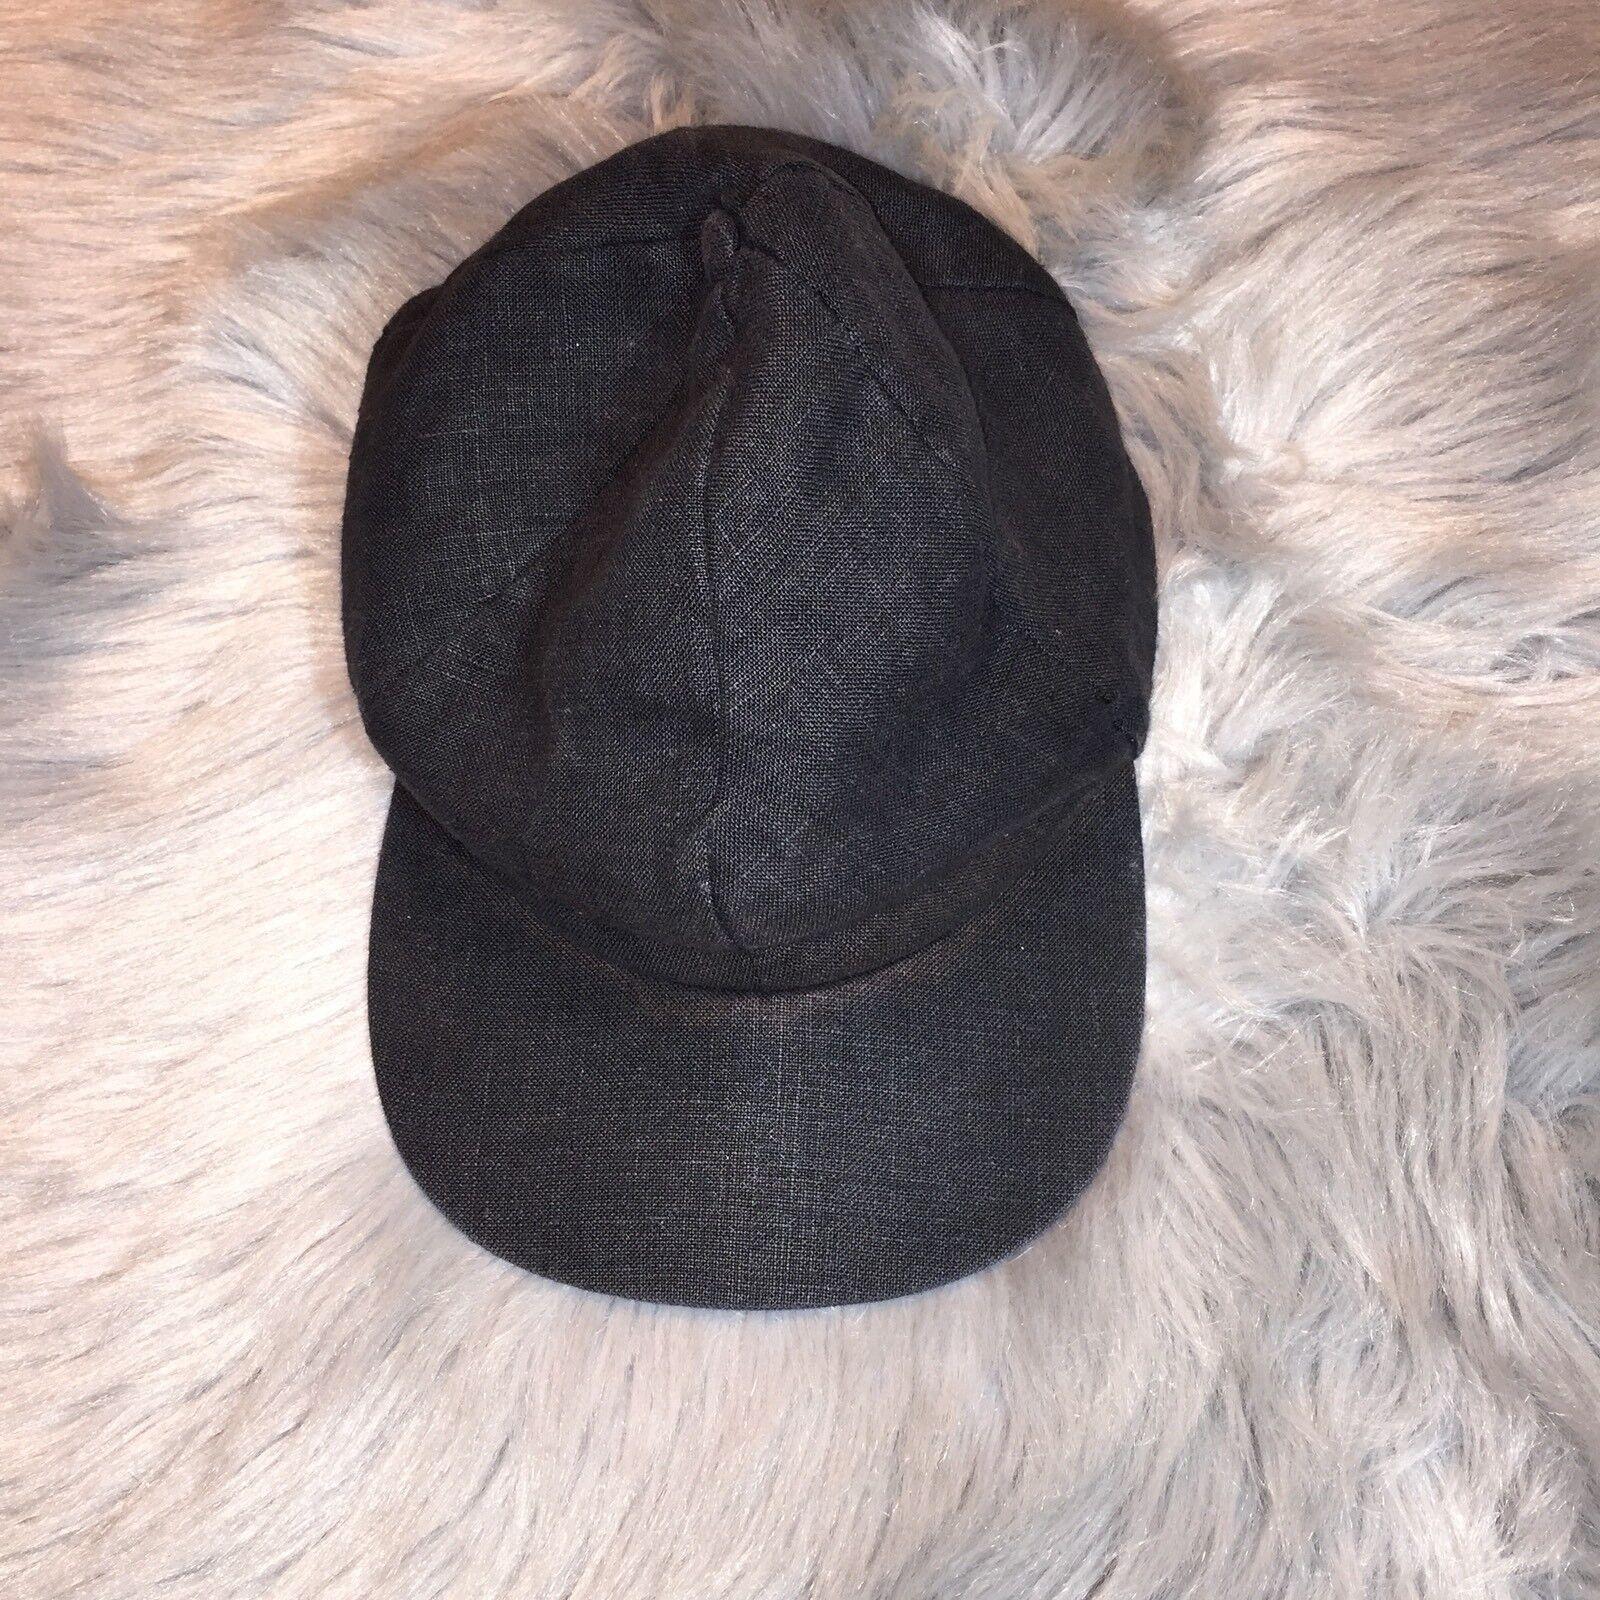 Capas Headwear NY Meyer Cap The Hatter Hat Cone Baseball Cap Meyer NICE 3d9889